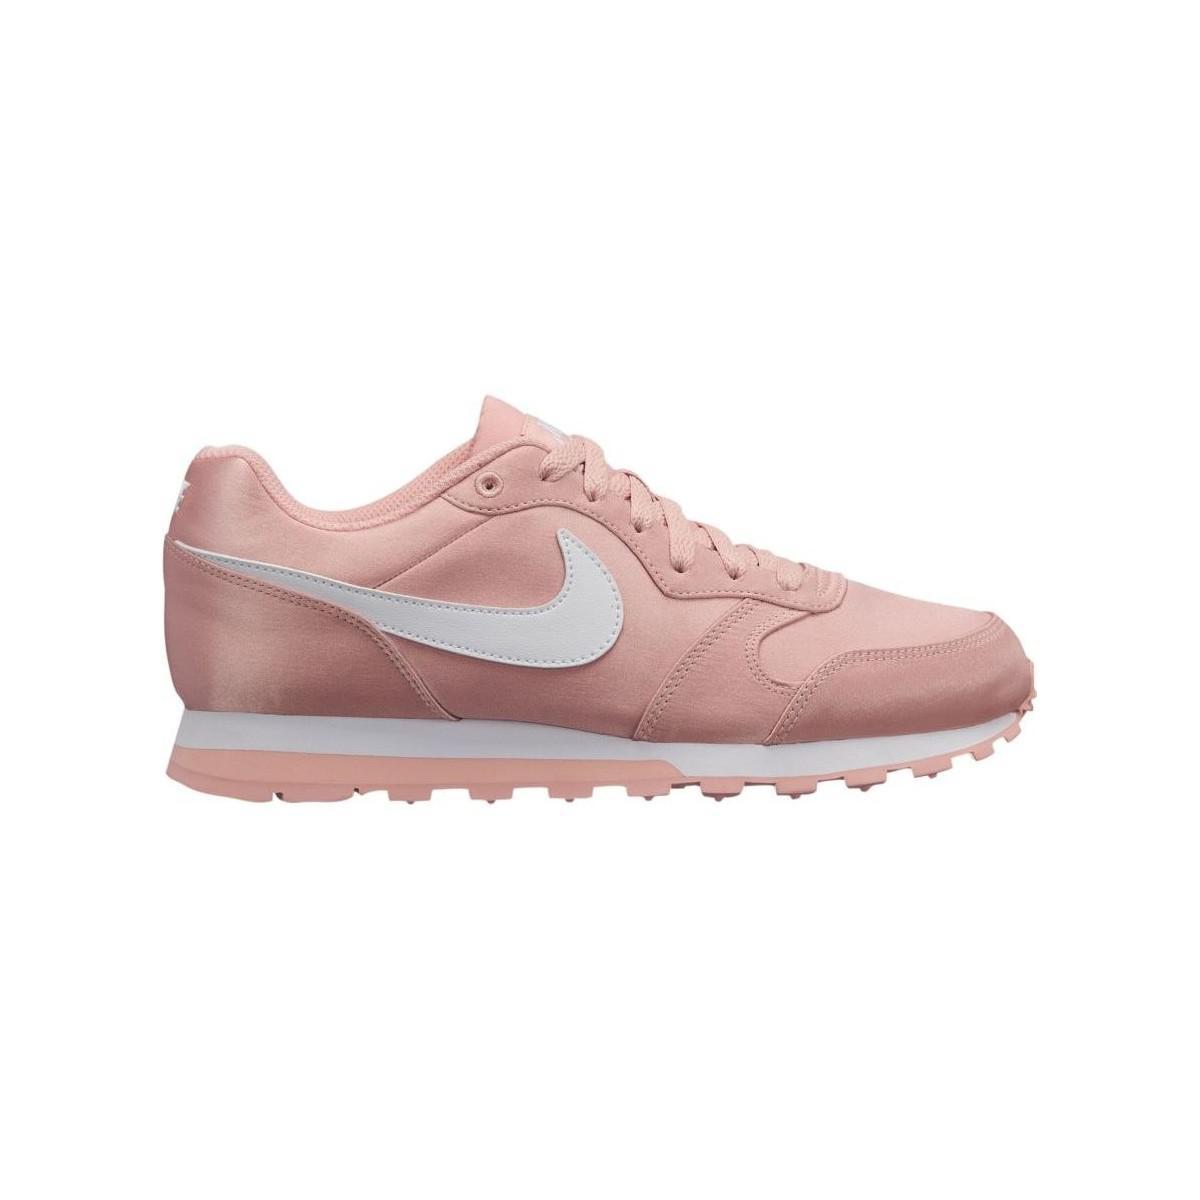 67022734b0db Nike Women s Md Runner 2 Shoe 749869 Women s Shoes (trainers) In ...